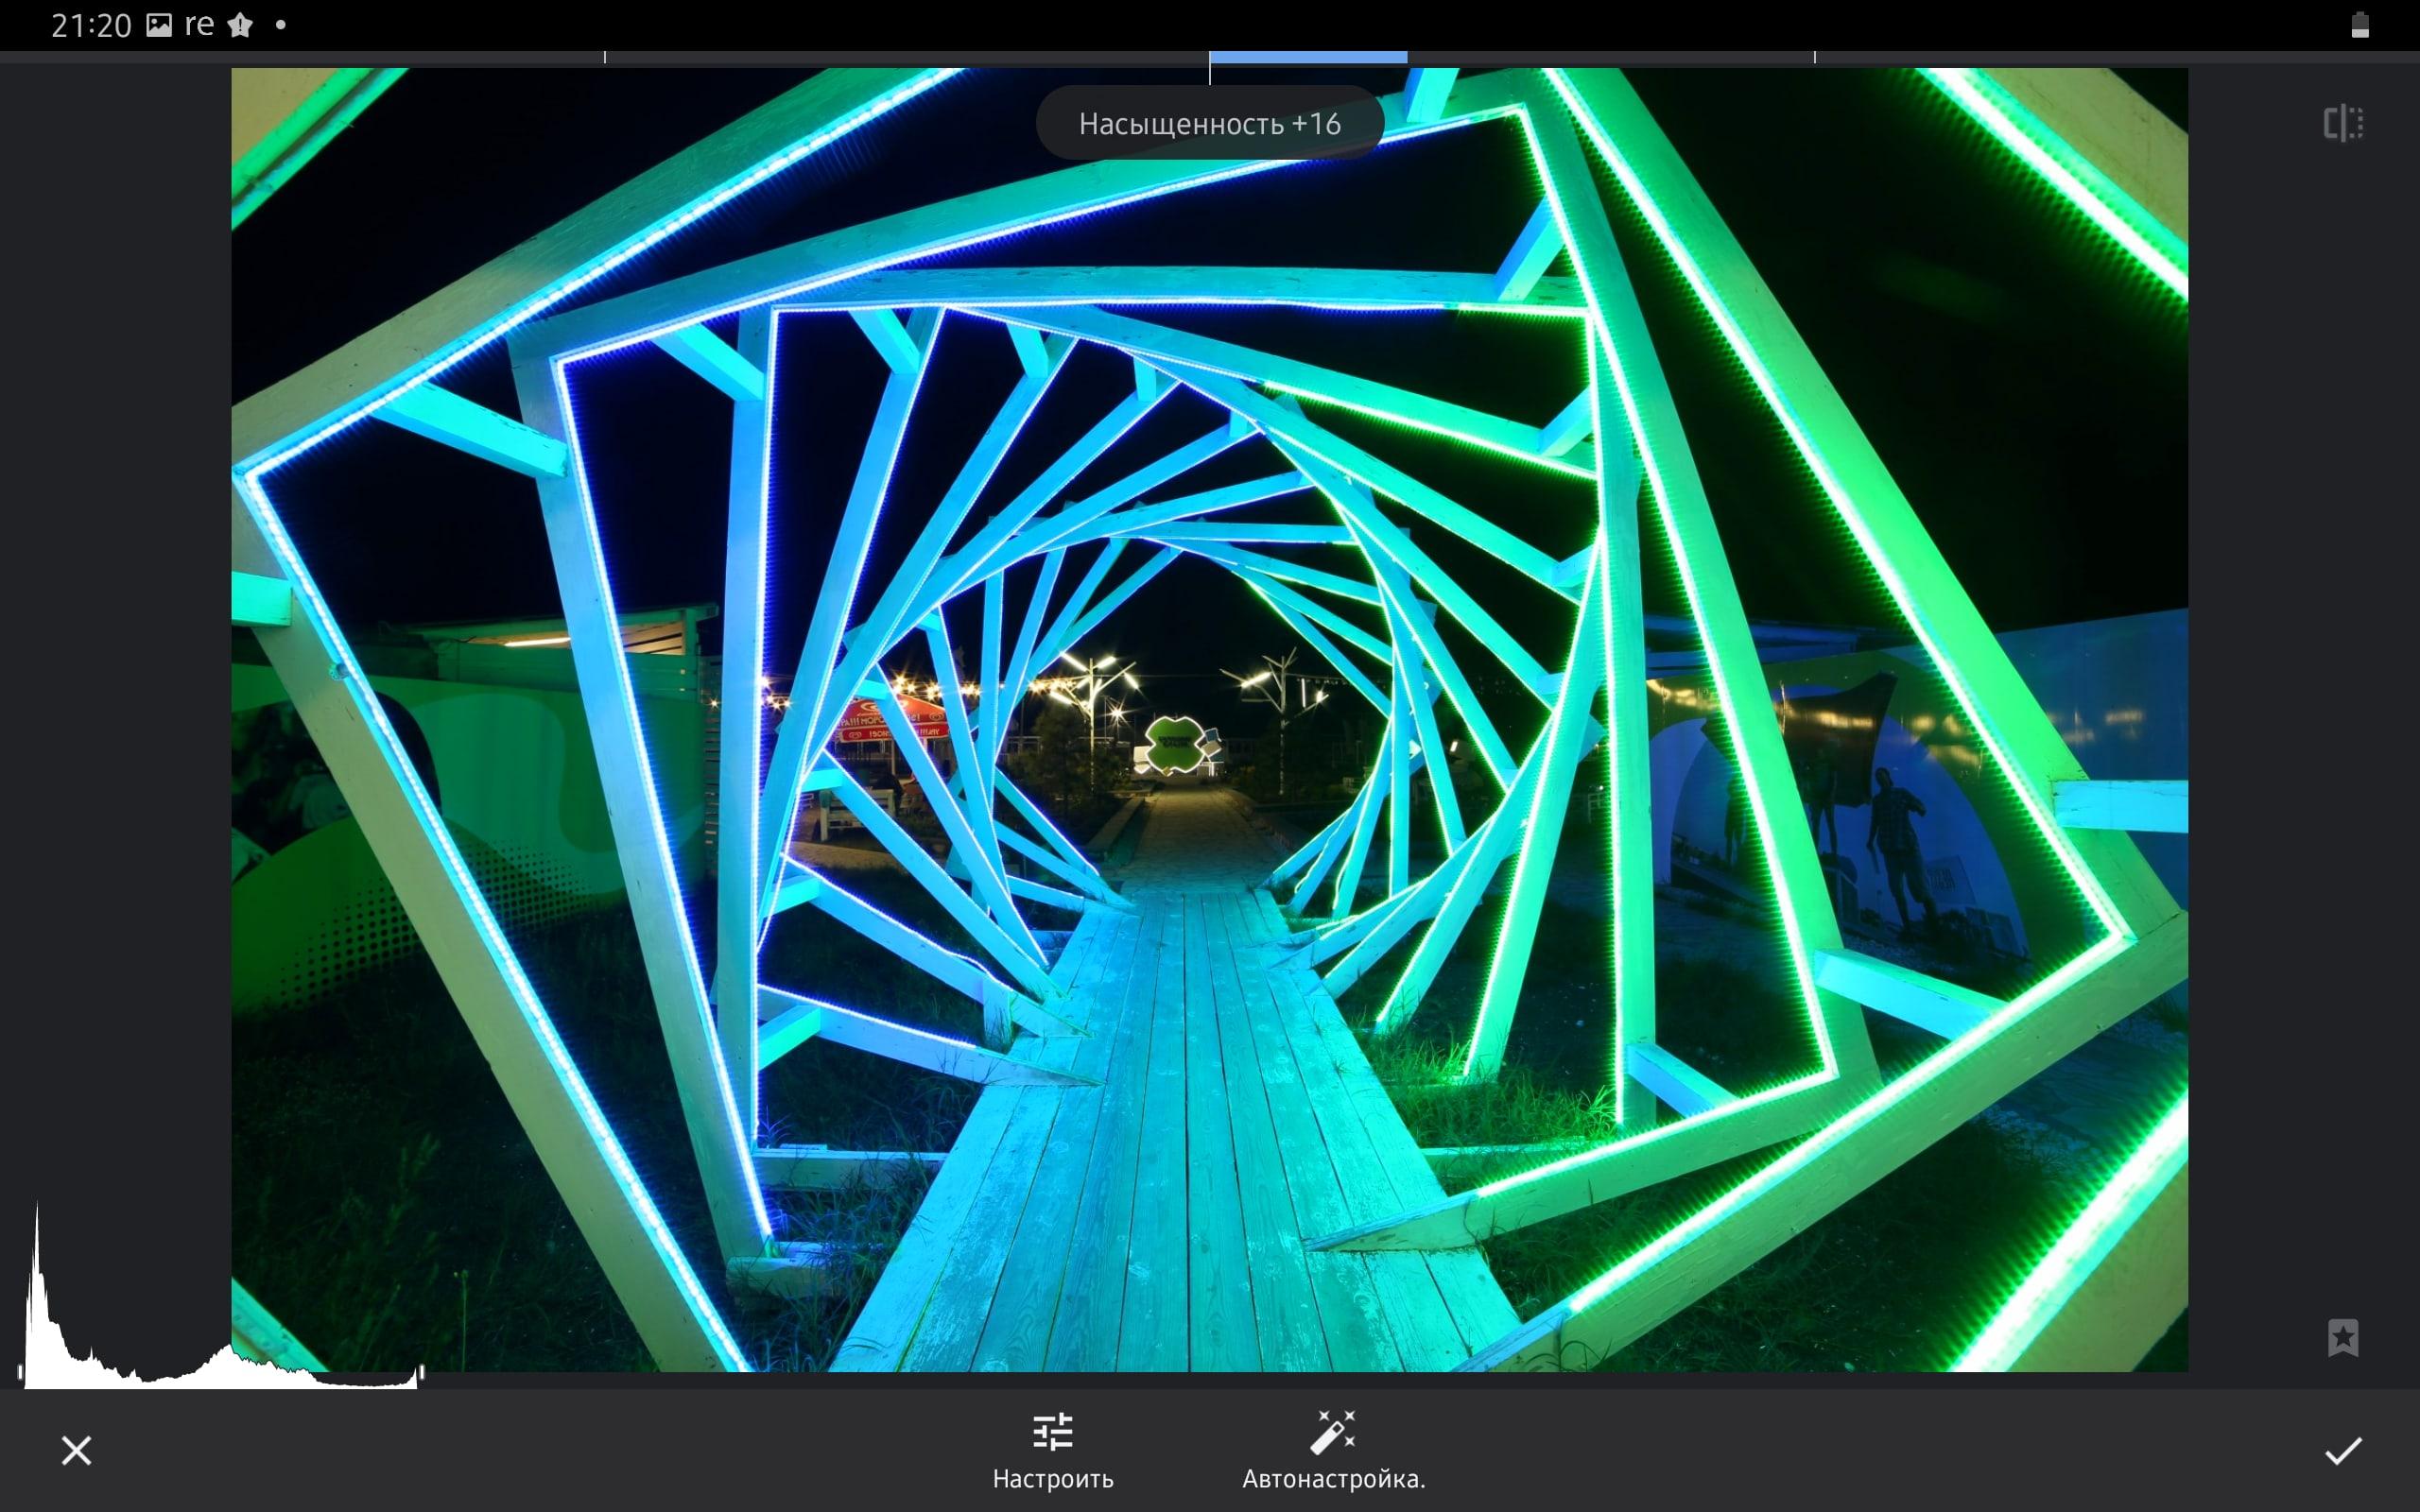 фоторедактор андроид, Топ 4 фото редактора на android